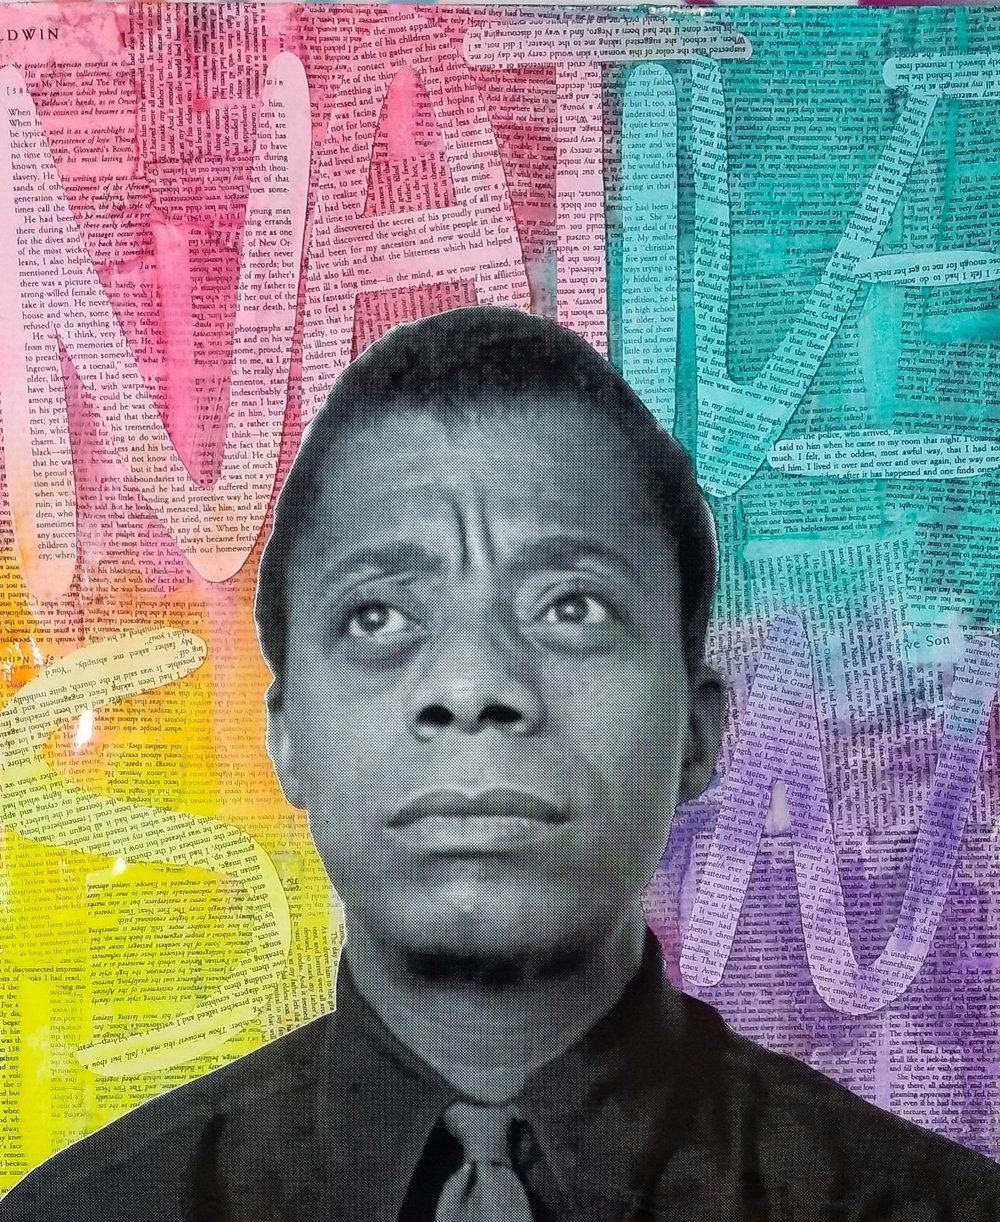 James+Baldwin.jpg